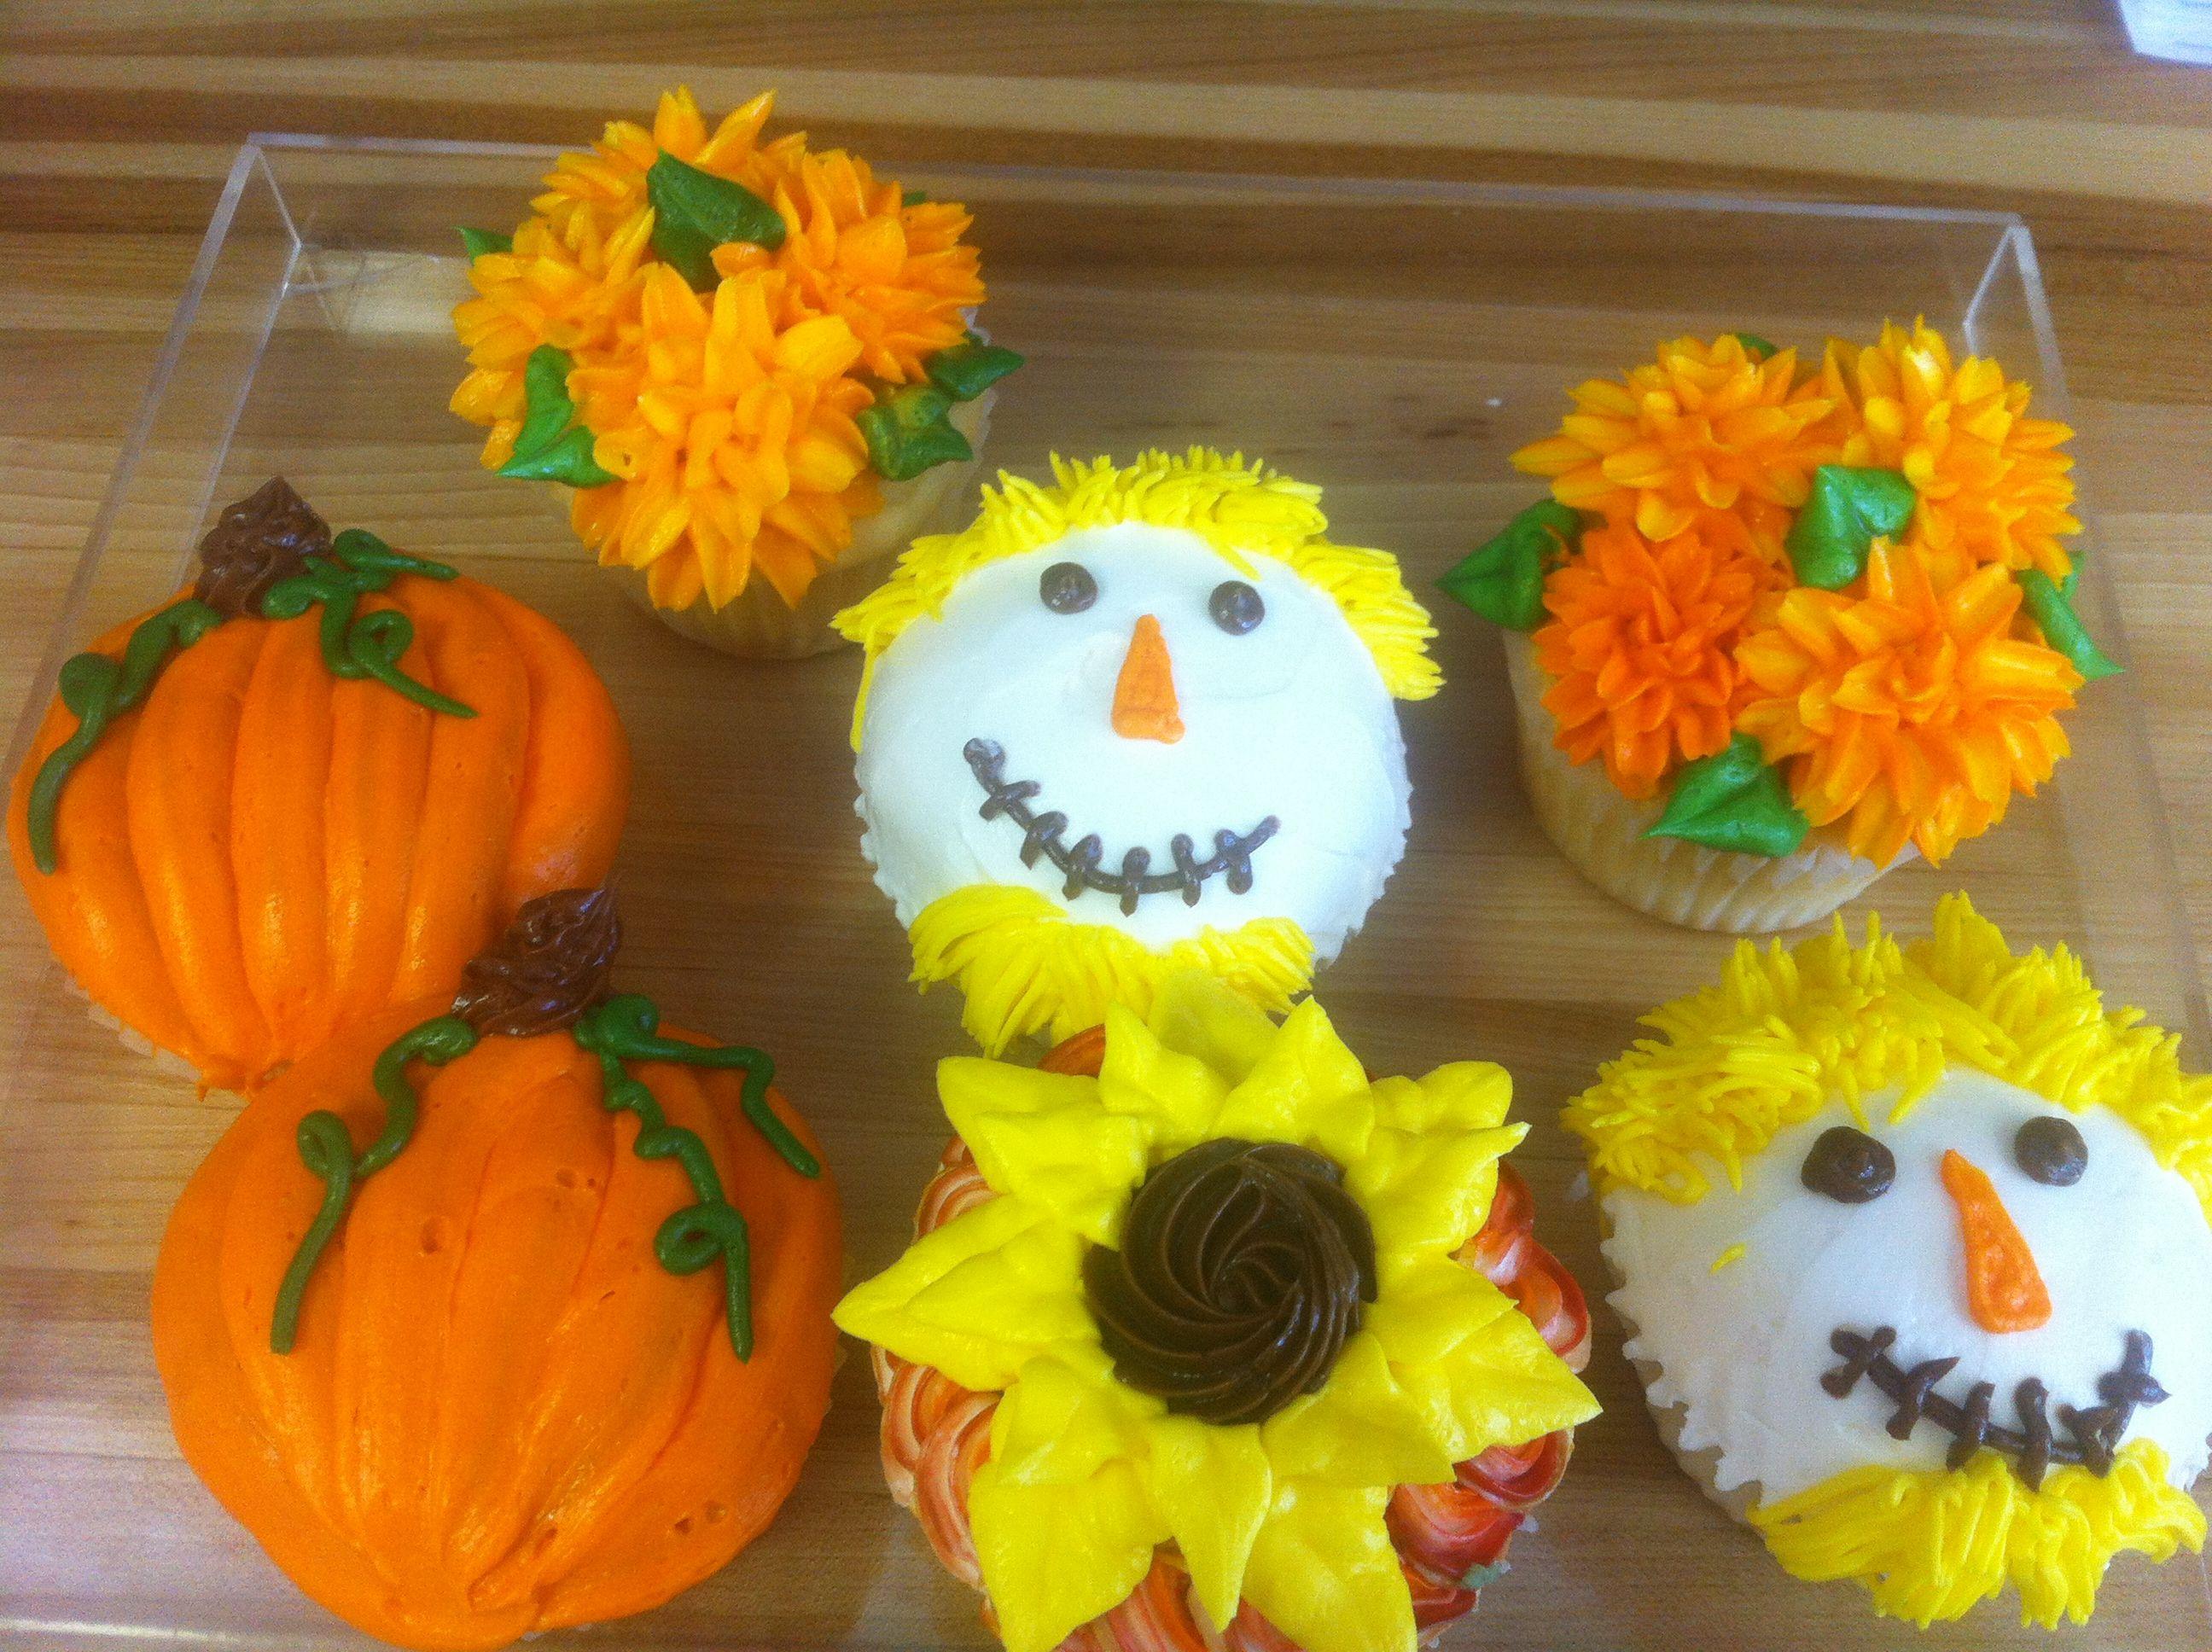 Fall Themed Cupcakes  Fall themed cupcakes pumpkin scarecrow